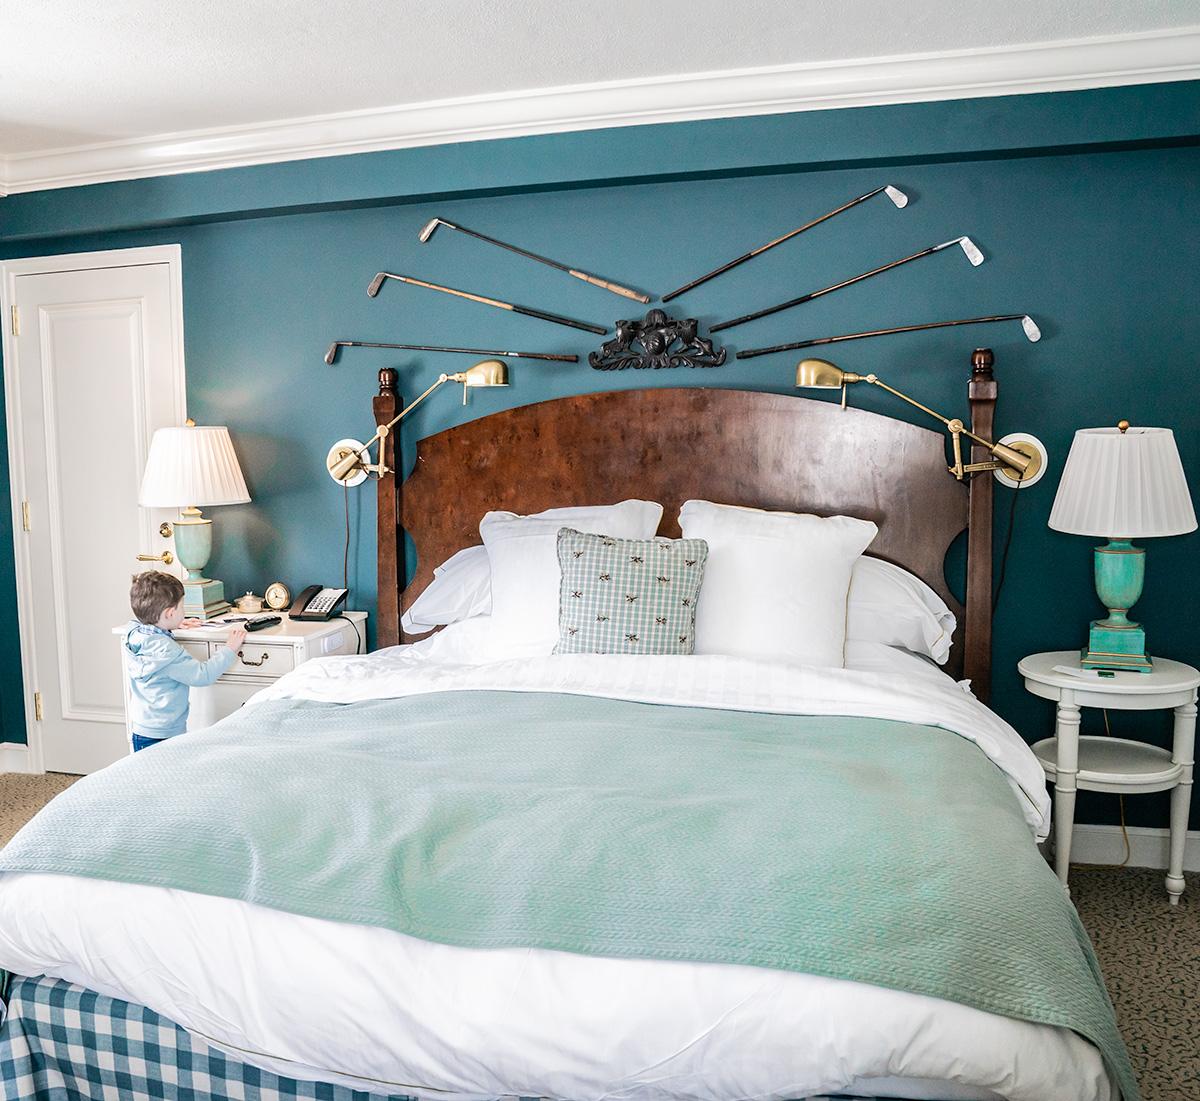 Bedroom-at-The-Woodstock-Inn-and-Resort